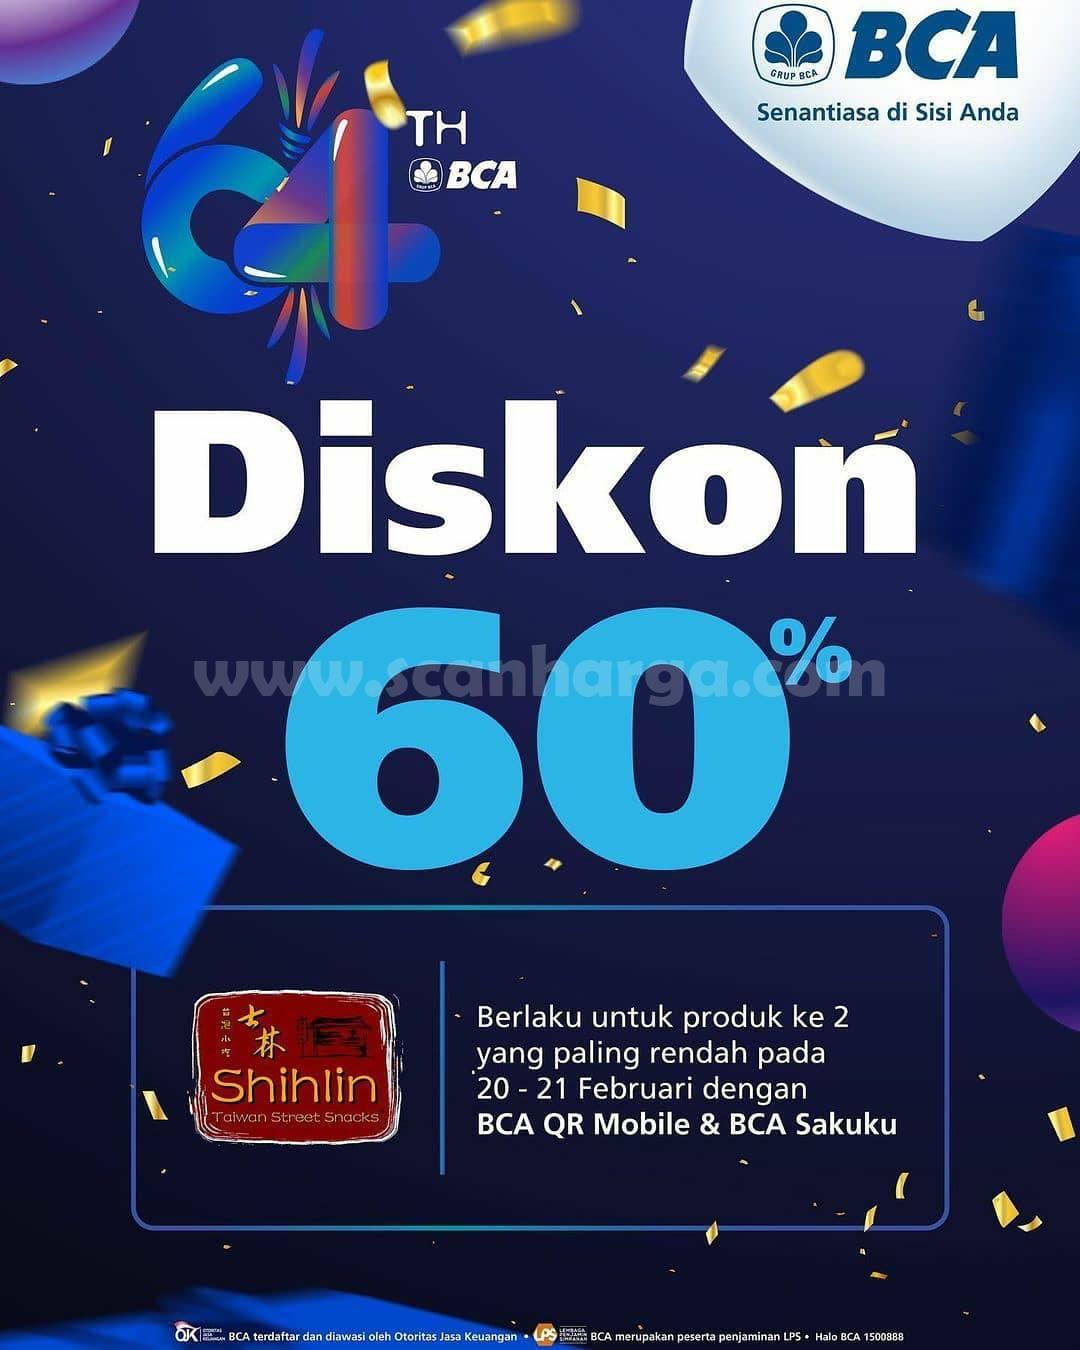 SHIHLIN Promo HUT BCA! DISKON 60% untuk produk ke-2